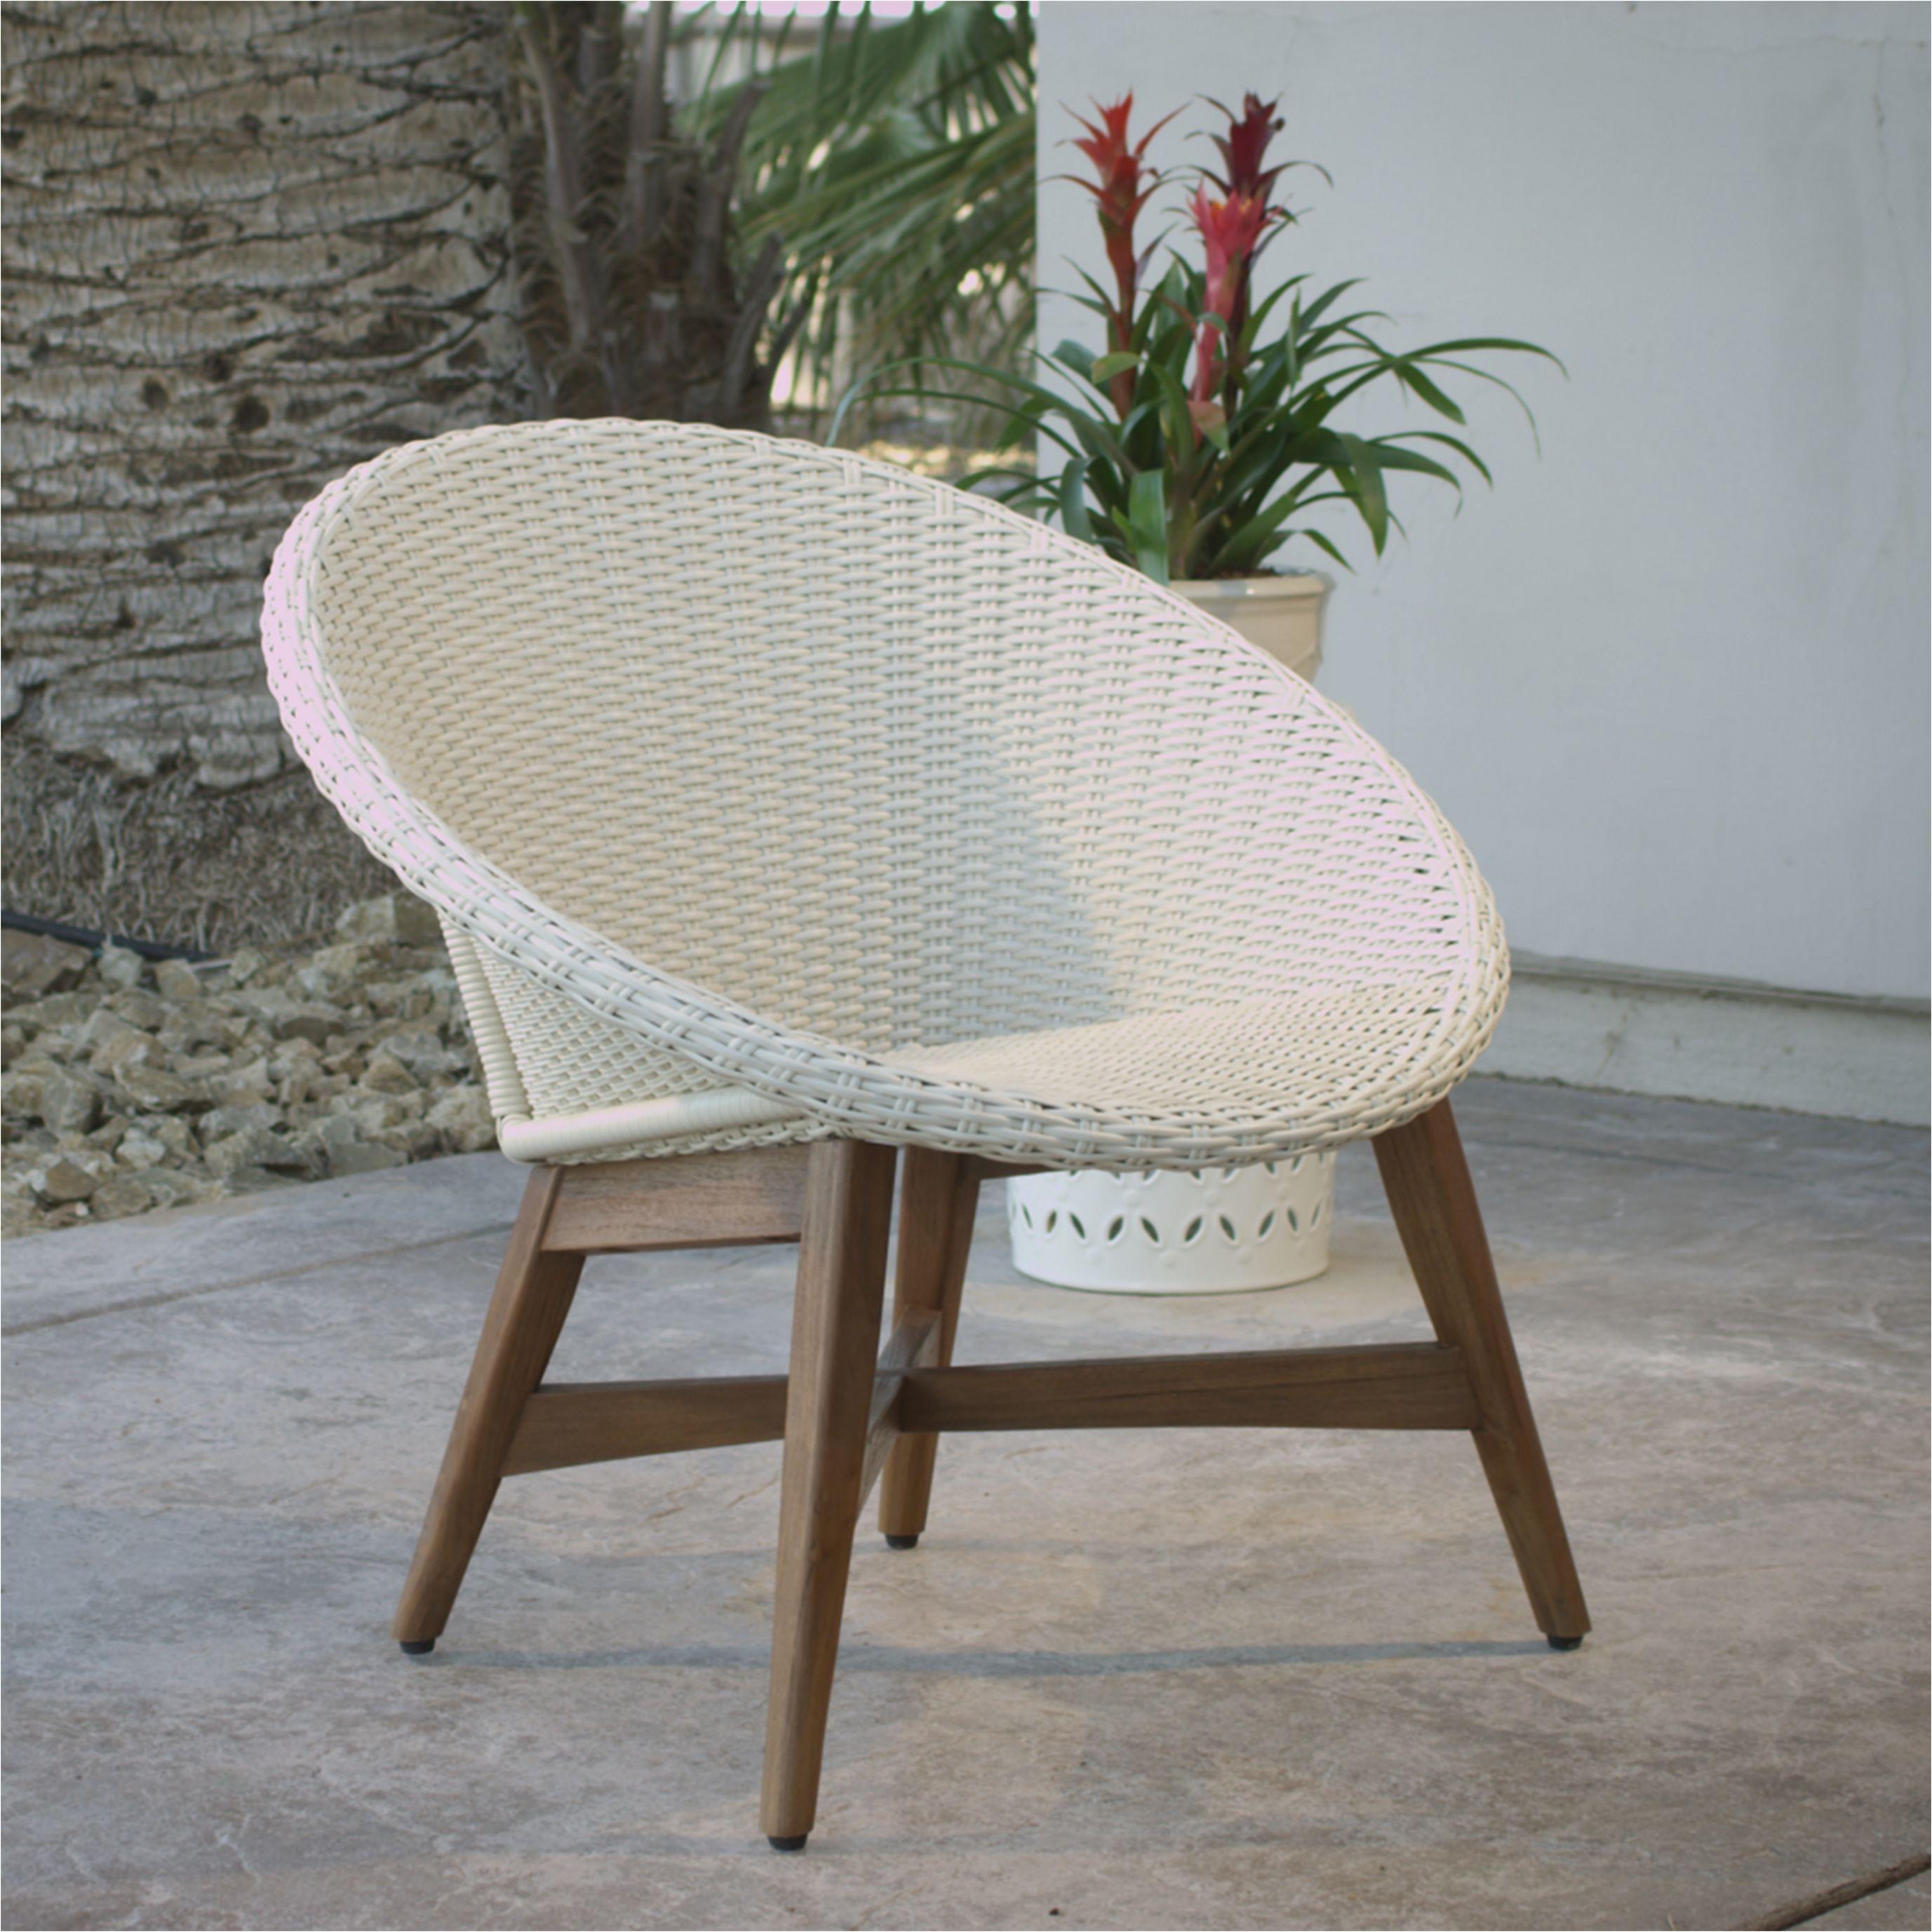 Black Adirondack Chairs World Market Pin by Annora On Home Interior Pinterest Interiors